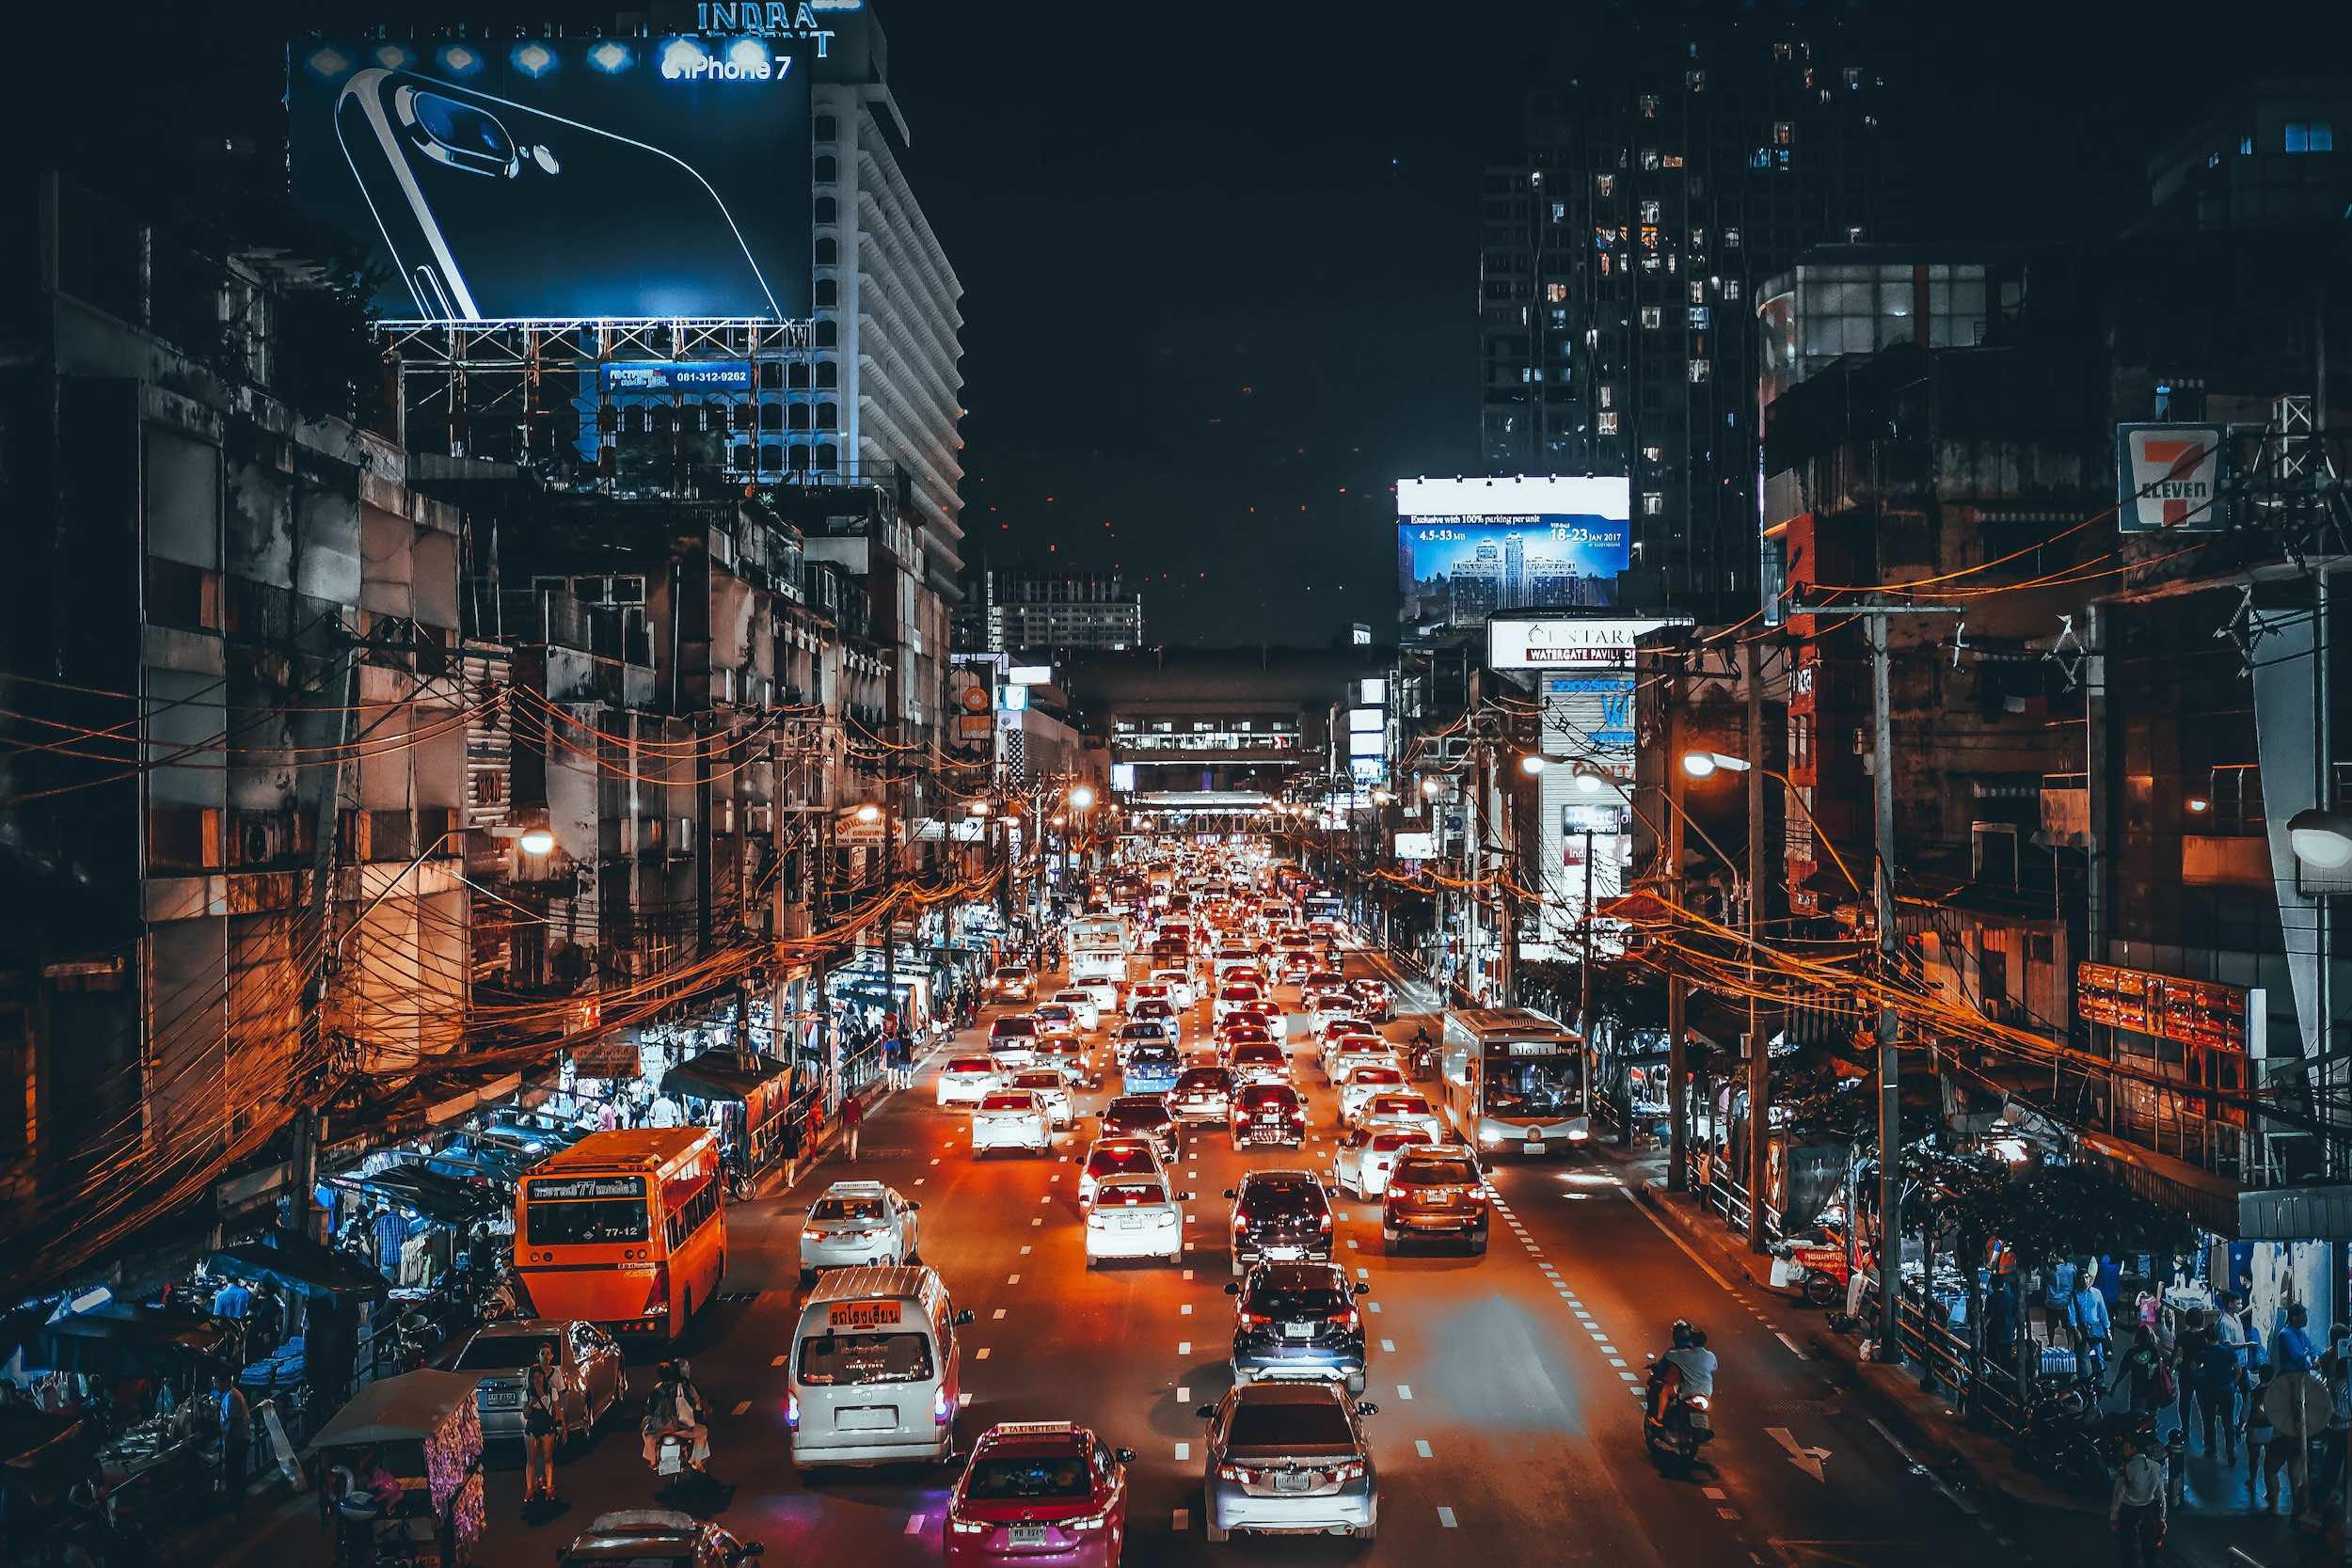 Bangkok_traffic_night_travel_bangkok.jpg